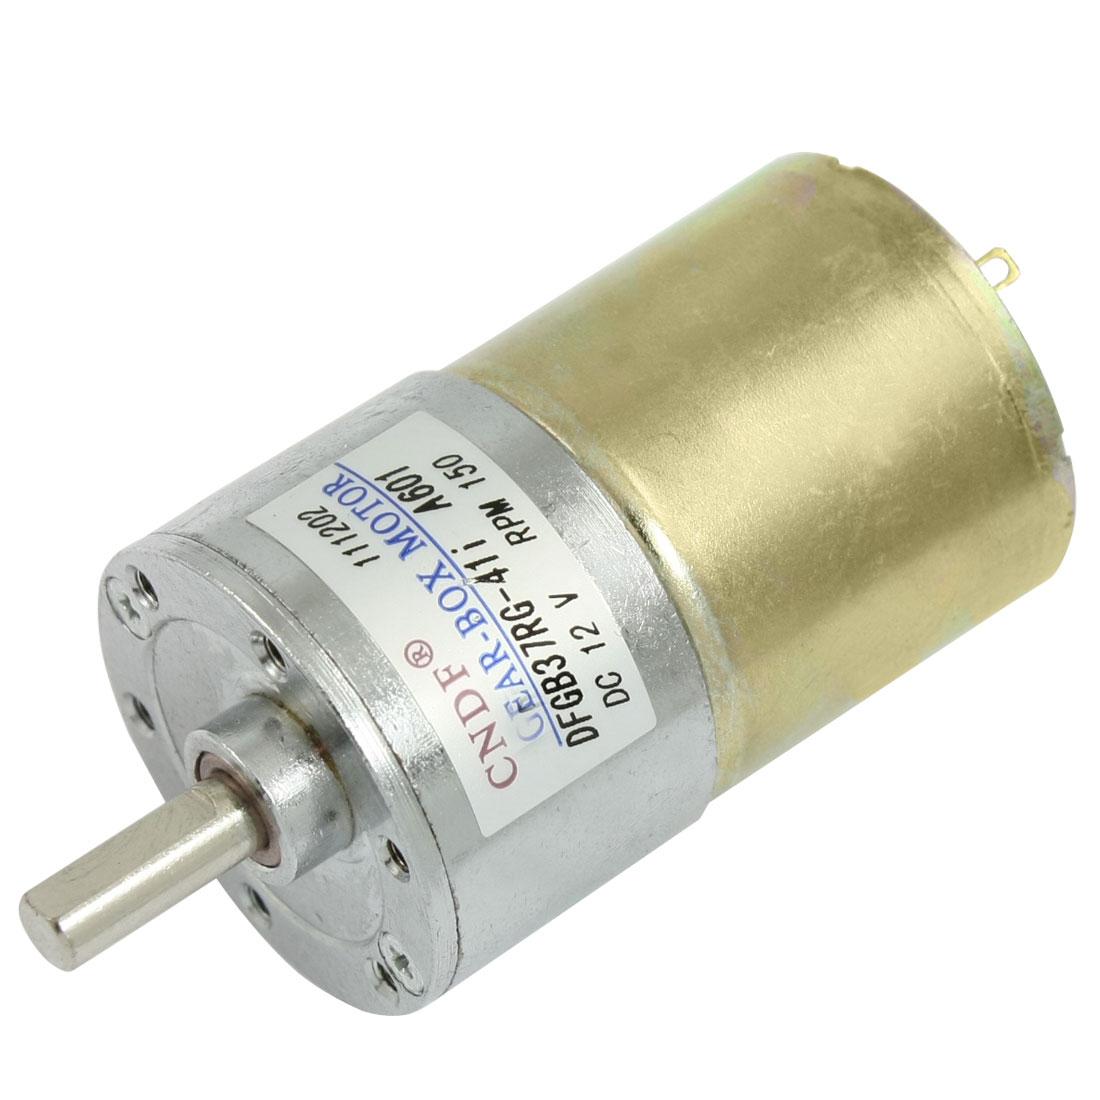 150RPM 160mA 12V DC 2.04kg.cm Torque 37mm Dia Magnetic Gear Box Motor